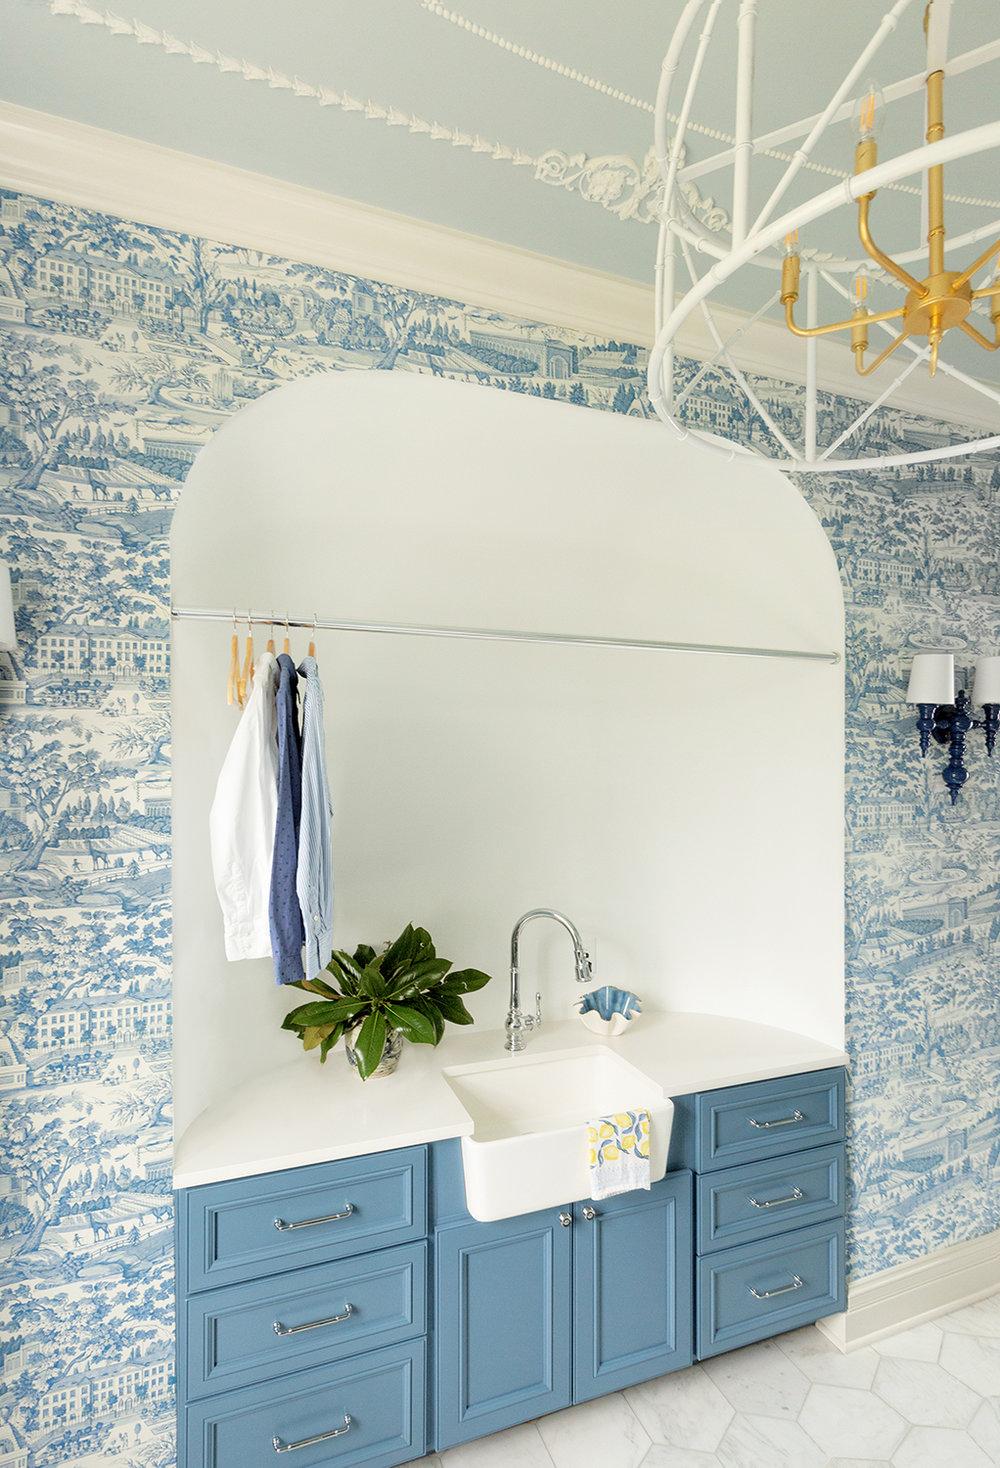 nashville-interior-photography-0002.jpg